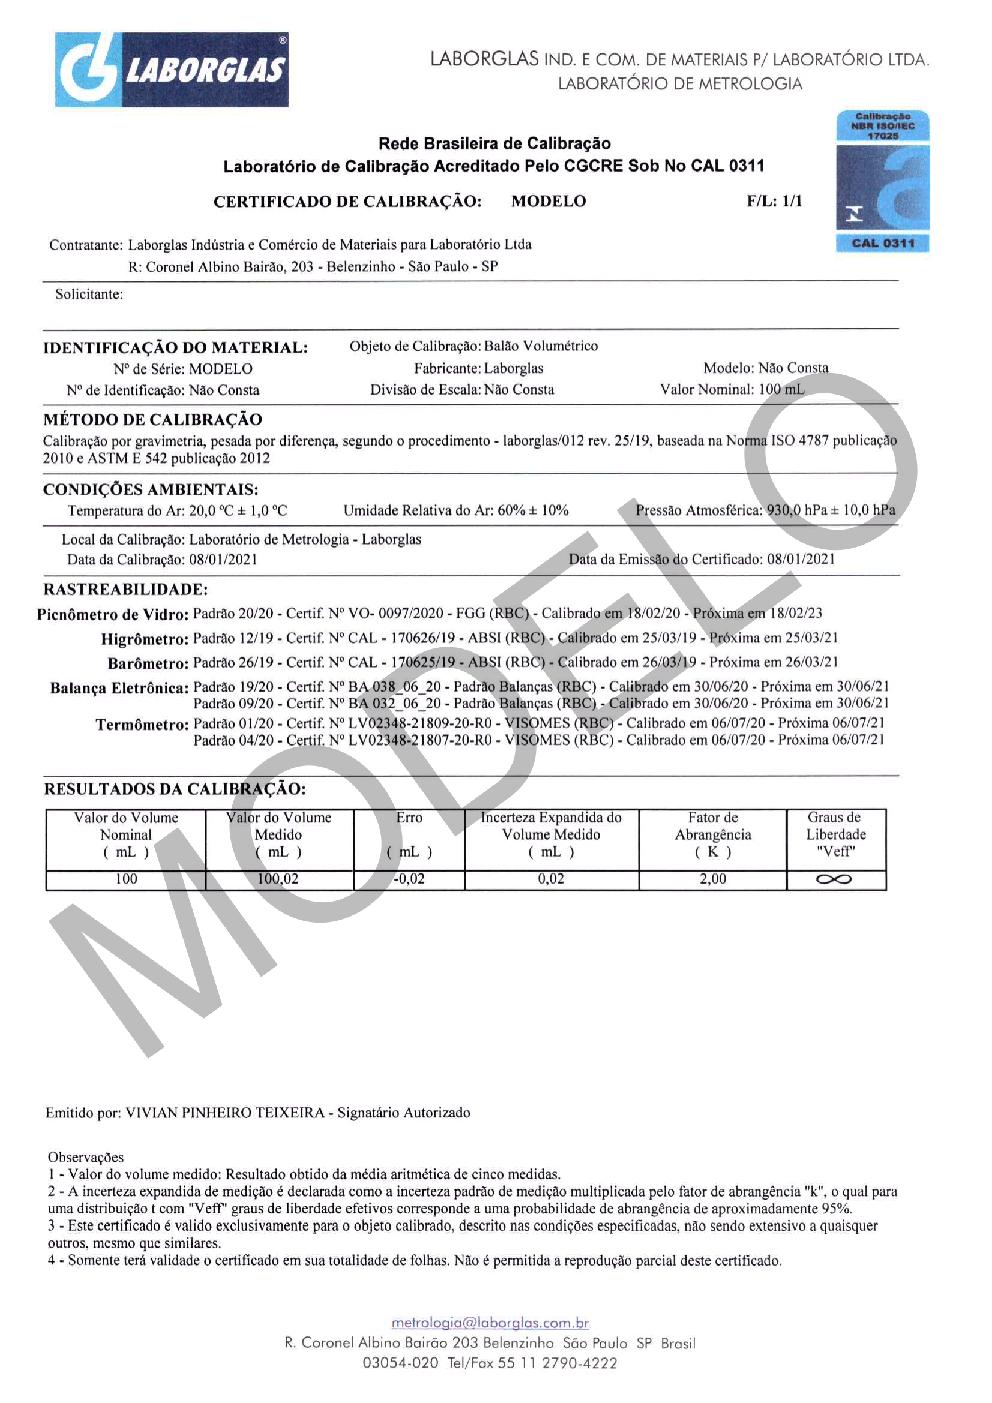 BALÃO VOLUMÉTRICO CLASSE A ROLHA POLI C/ CERTIFICADO RBC 50 ML - Marca Laborglas - Cód. 9167817-R